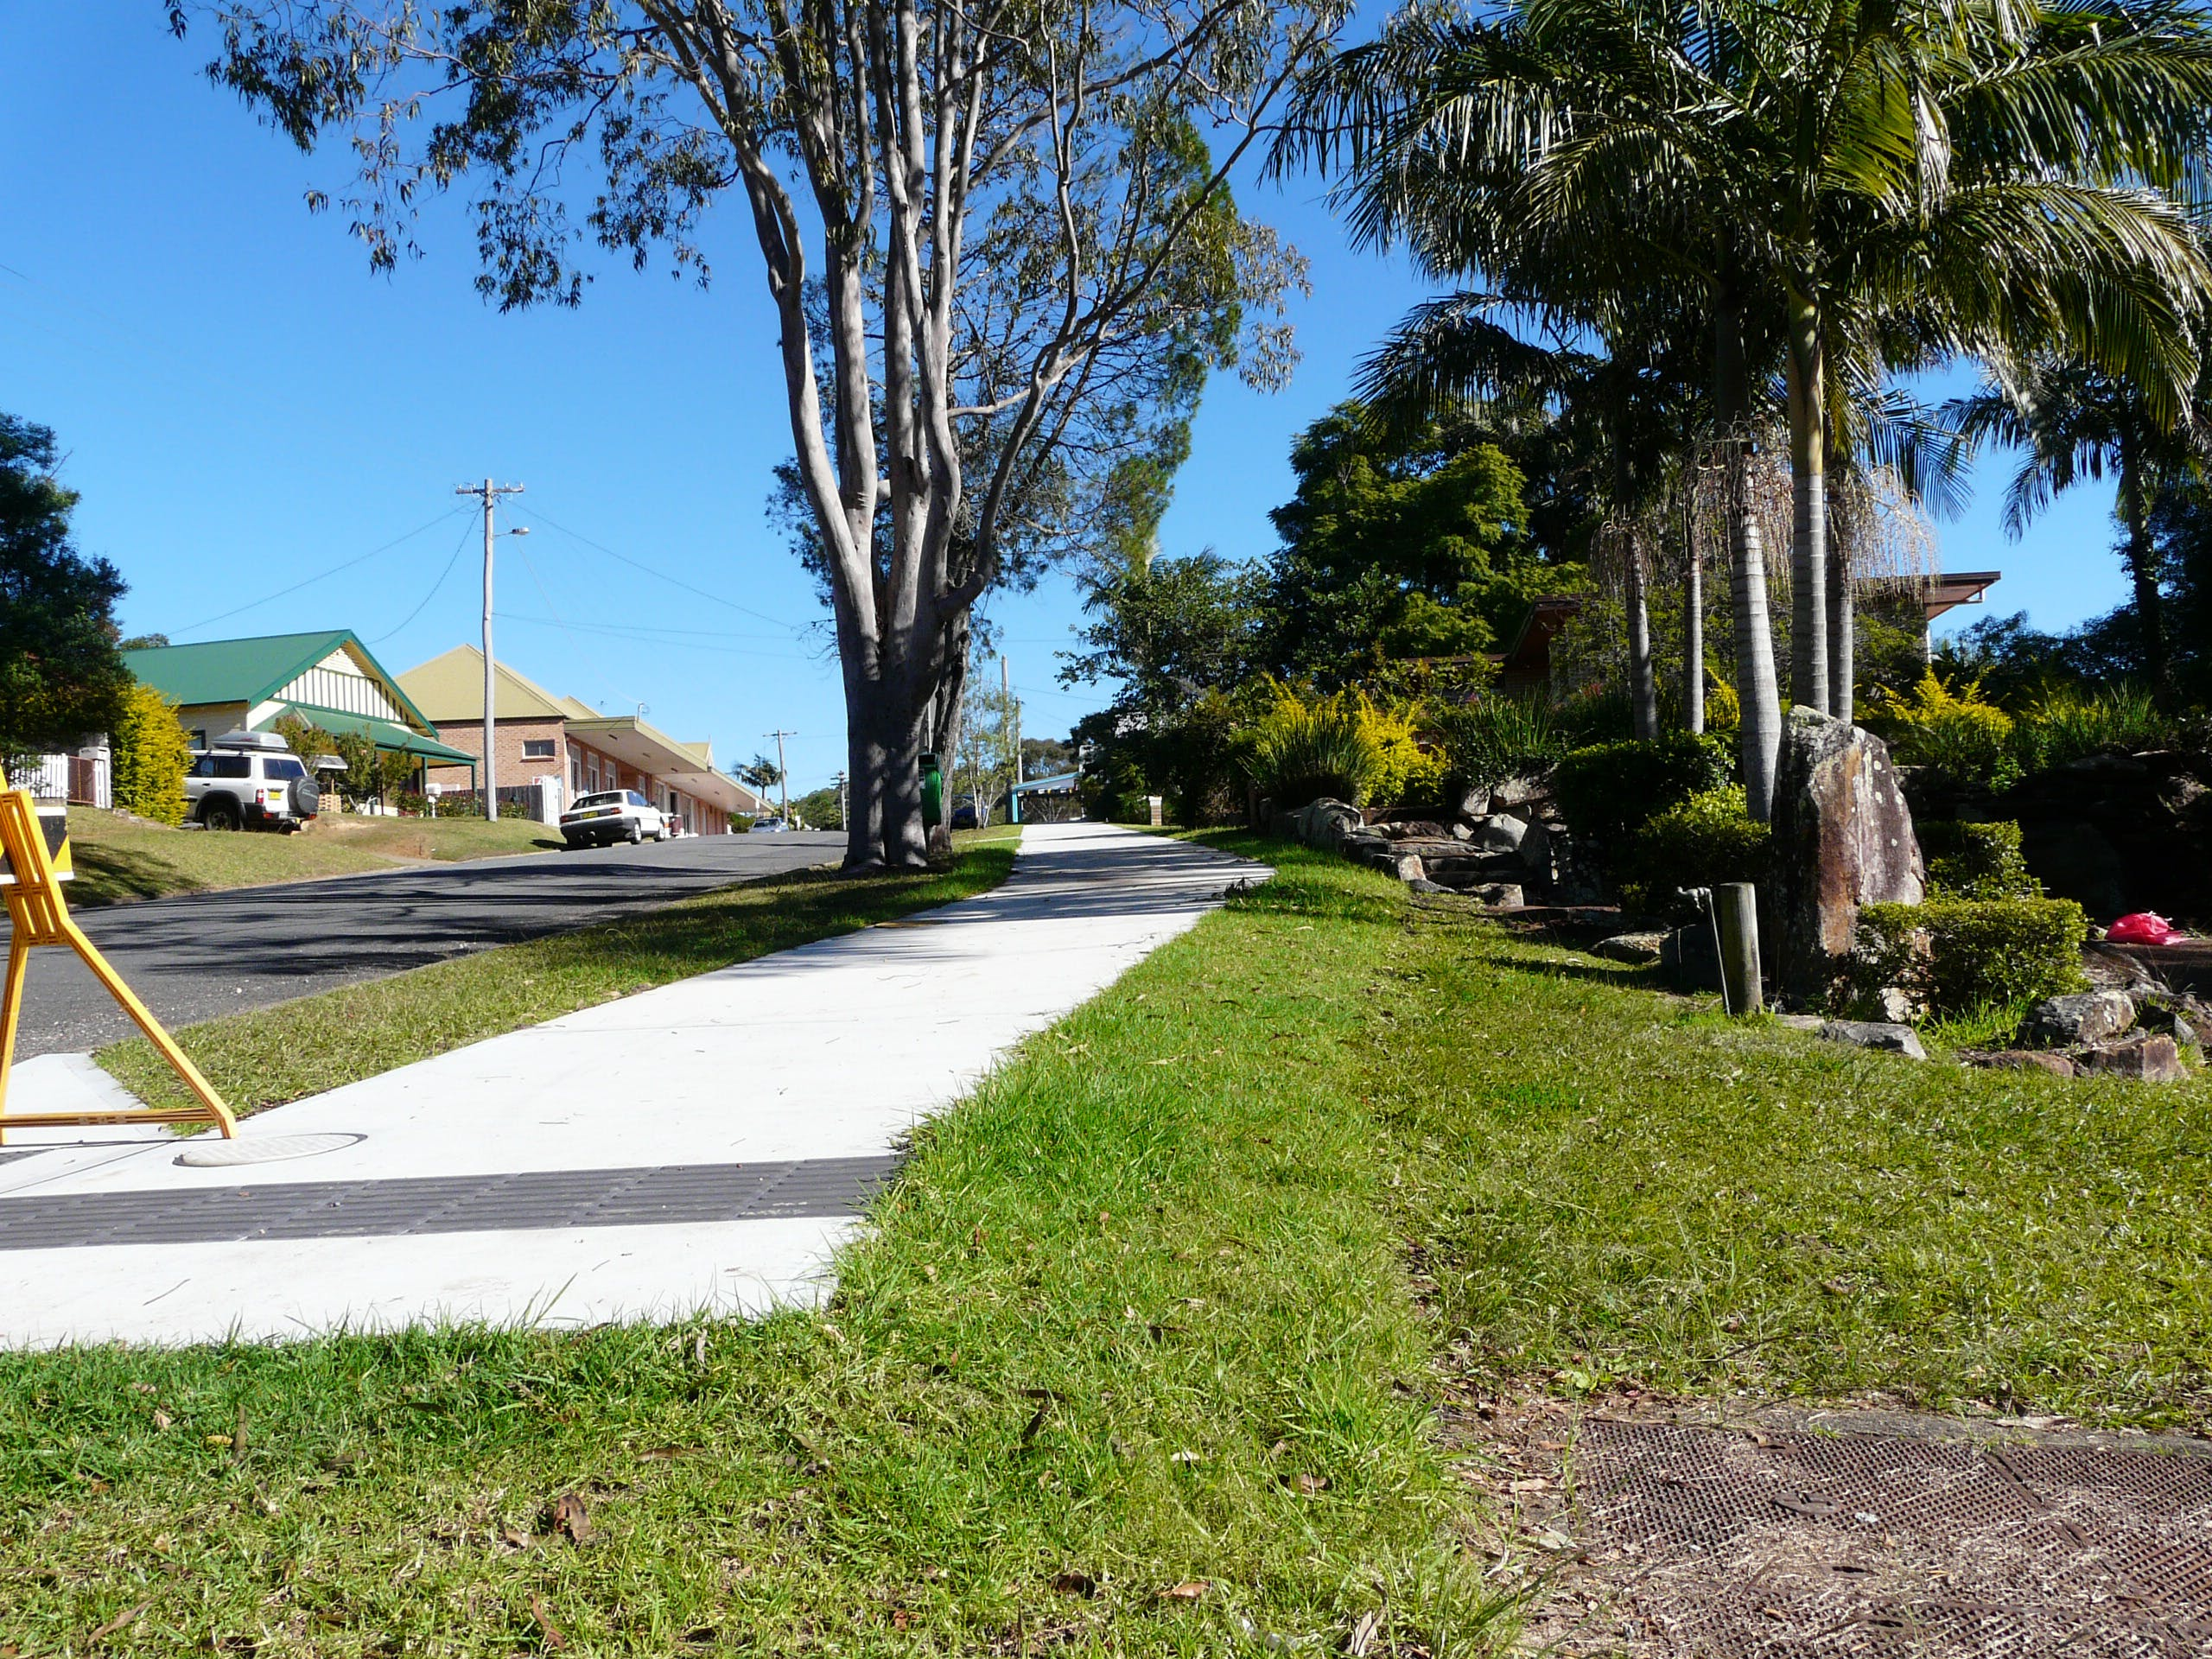 Residential Footpath